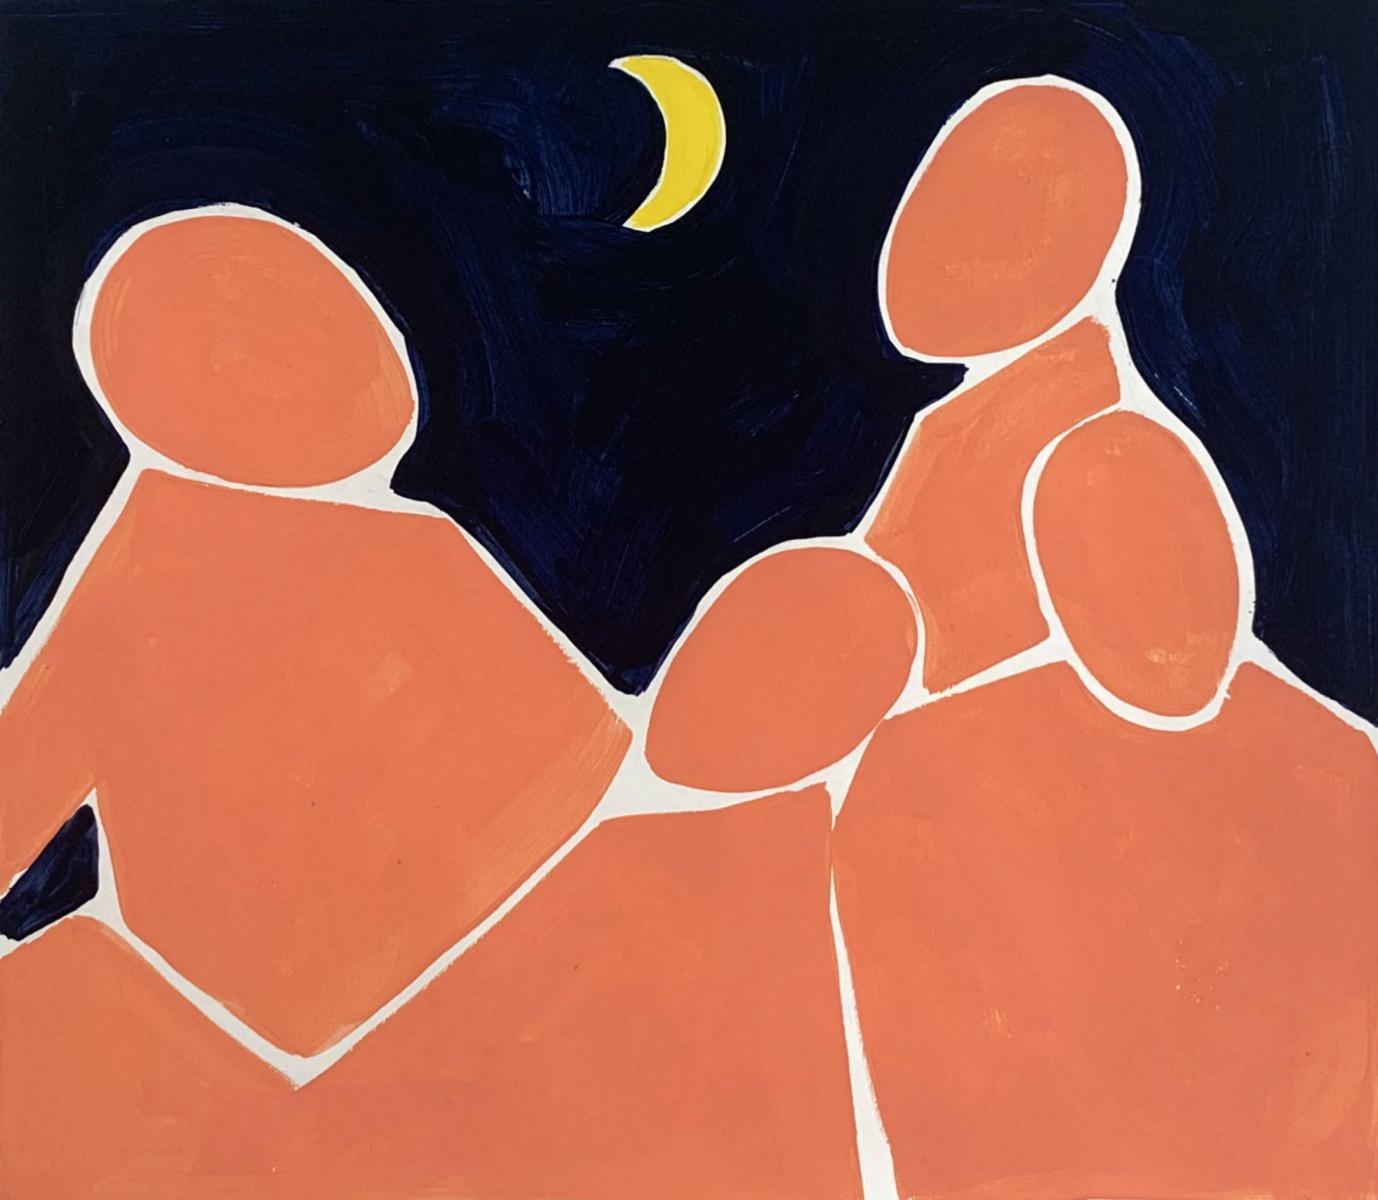 Night conversation - Figurative Acrylic Painting on Paper, Young art, Minimalism